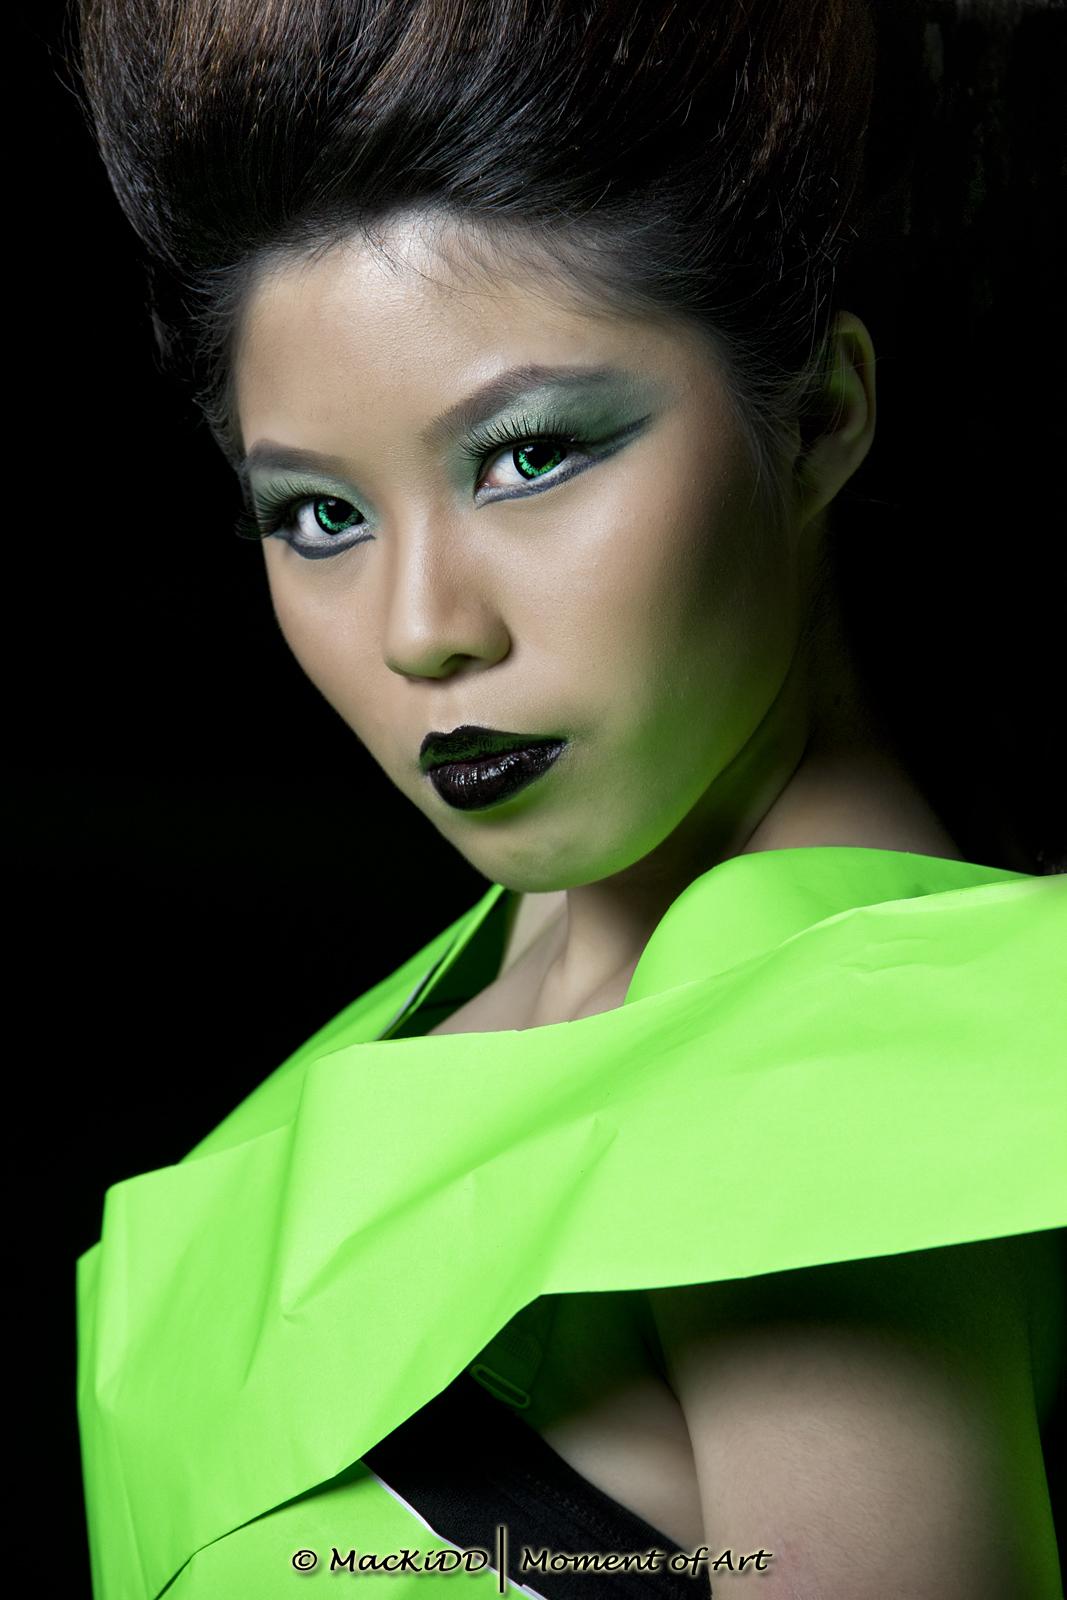 Cindi Pro Makeup Artist Commercial Photoshoot Makeup: :: Cindi Pro. Makeup Artist ::: Green Paperism